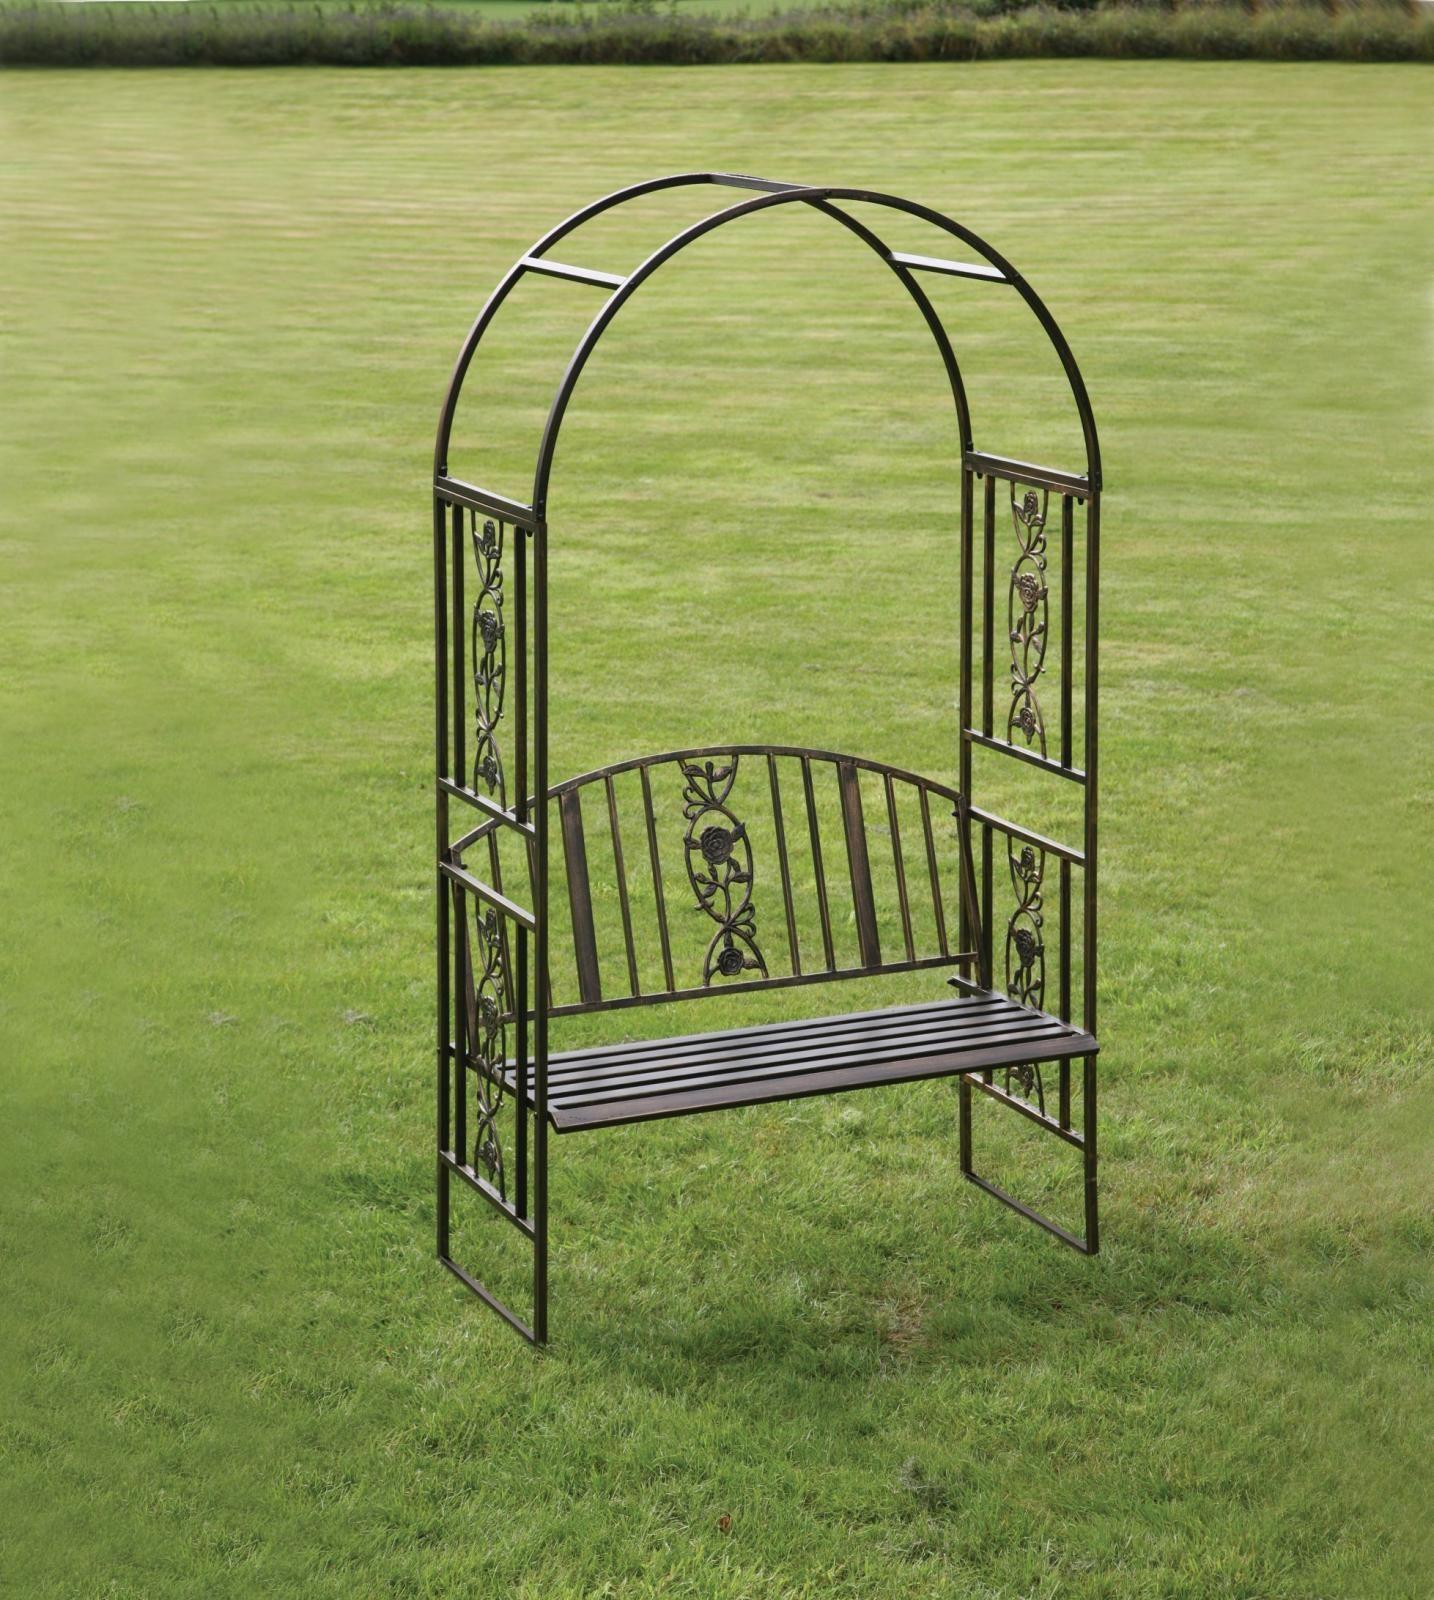 iron garden benches with rose design | Metal Garden Arch with bench seat | Garden  Arches - Iron Garden Benches With Rose Design Metal Garden Arch With Bench